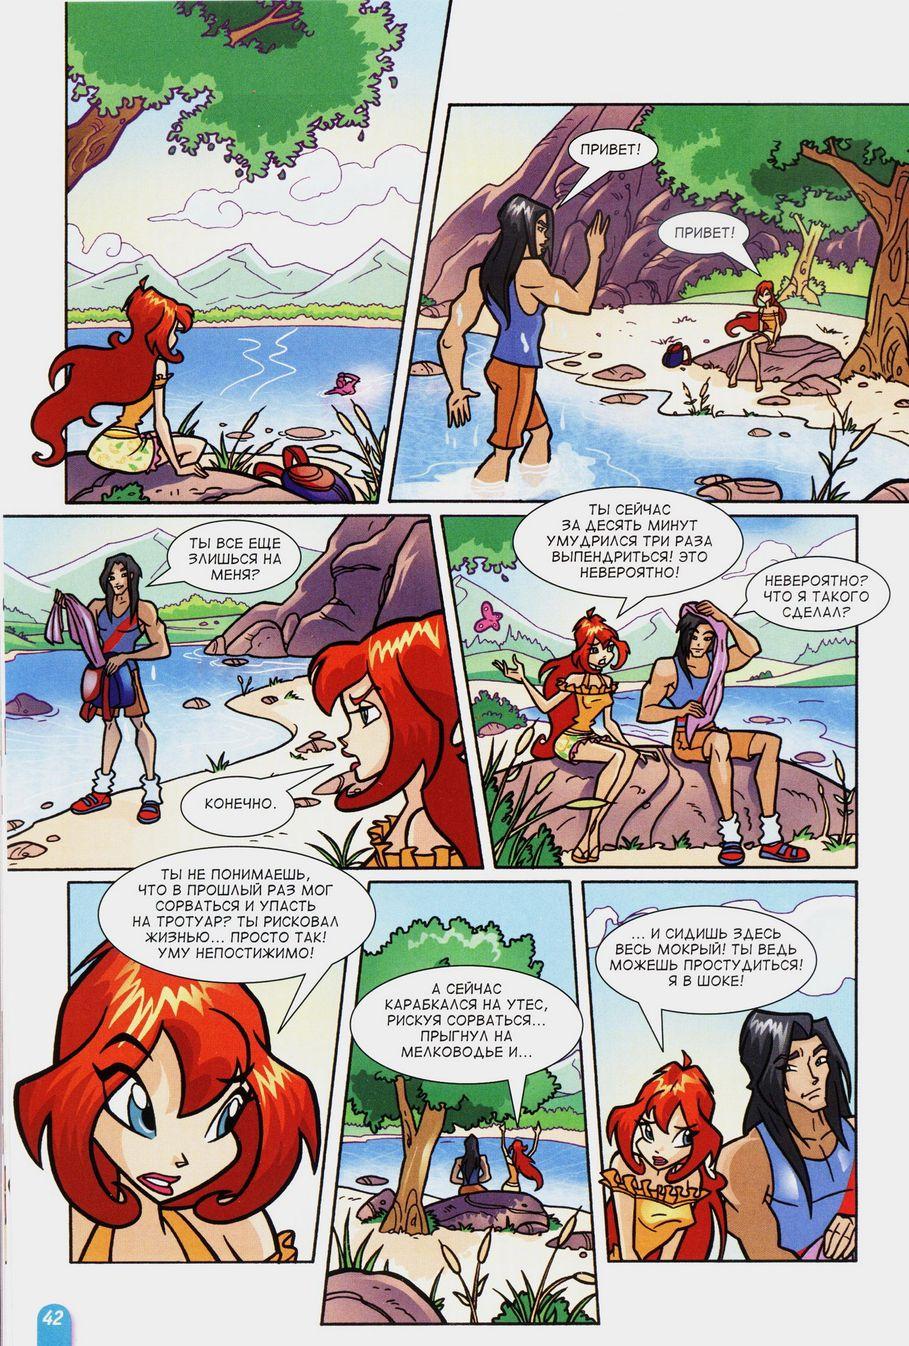 Комикс Винкс Winx - Неверное решение (Журнал Винкс №3 2011) - стр. 42